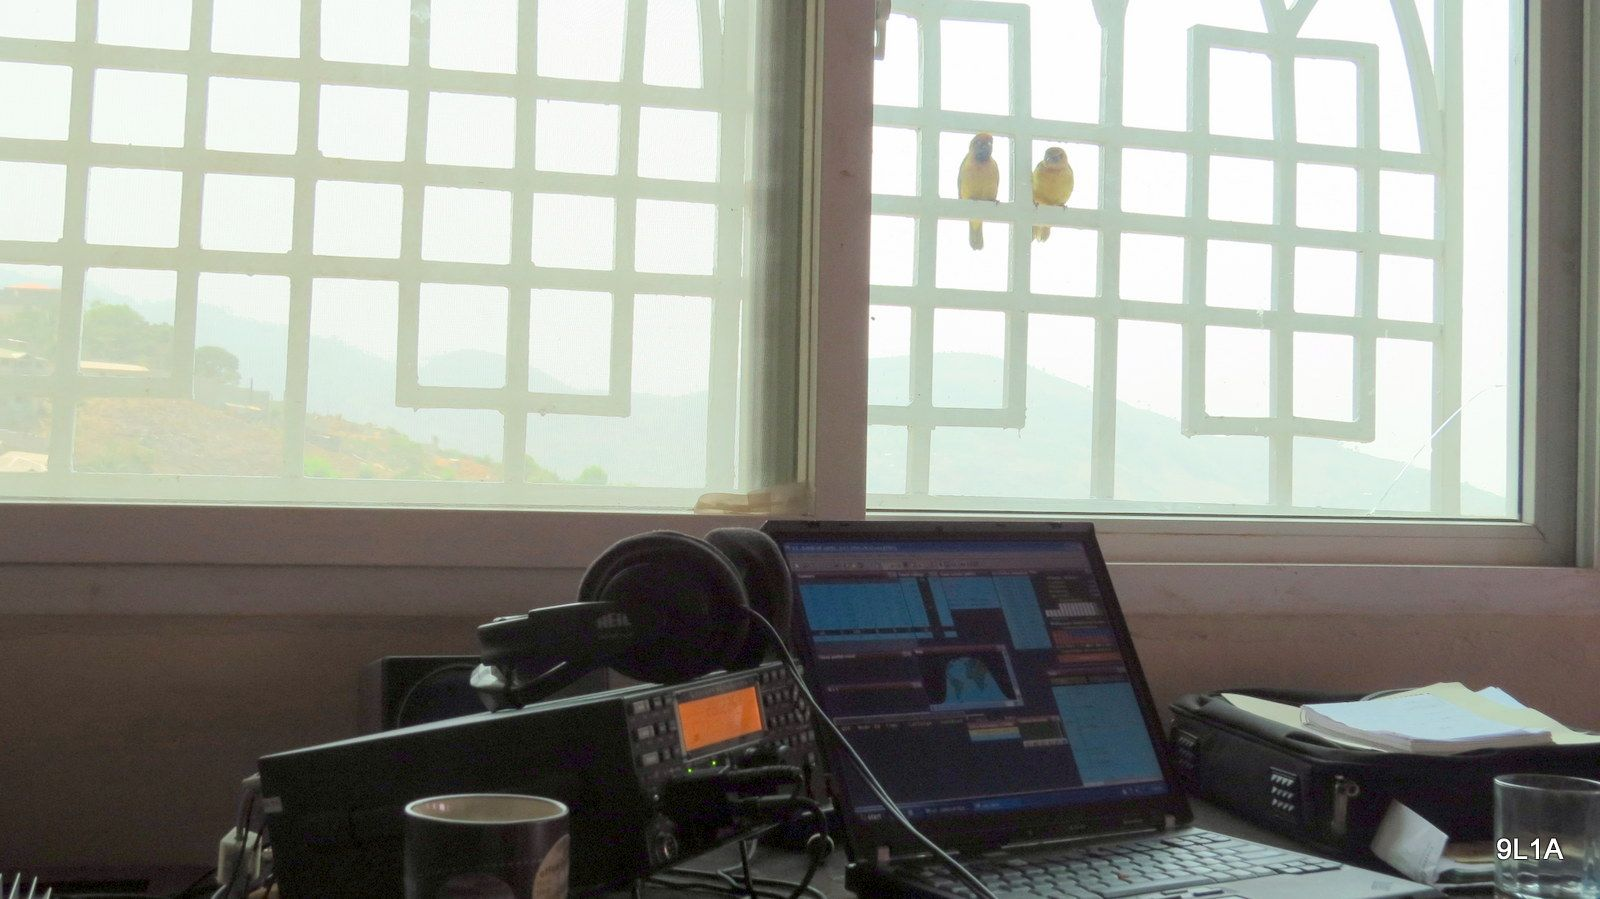 Sierra Leone 9L1A News Radio Room